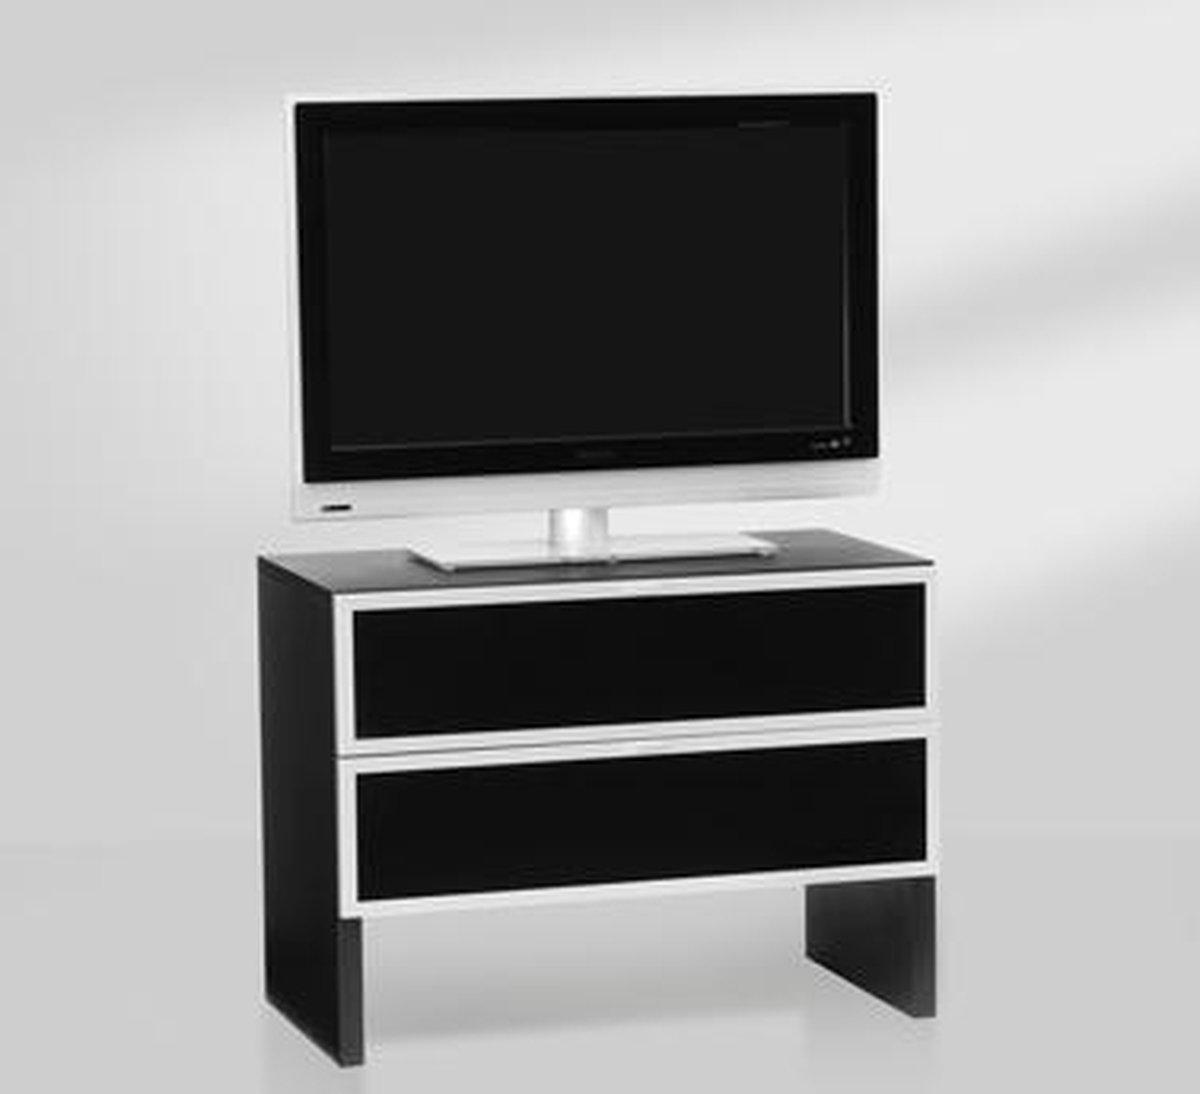 Aldenkamp Glazen Tv Meubel.Bol Com Aldenkamp Dutch Design Meubel Voor Led Tv A5728f 1 Zwart